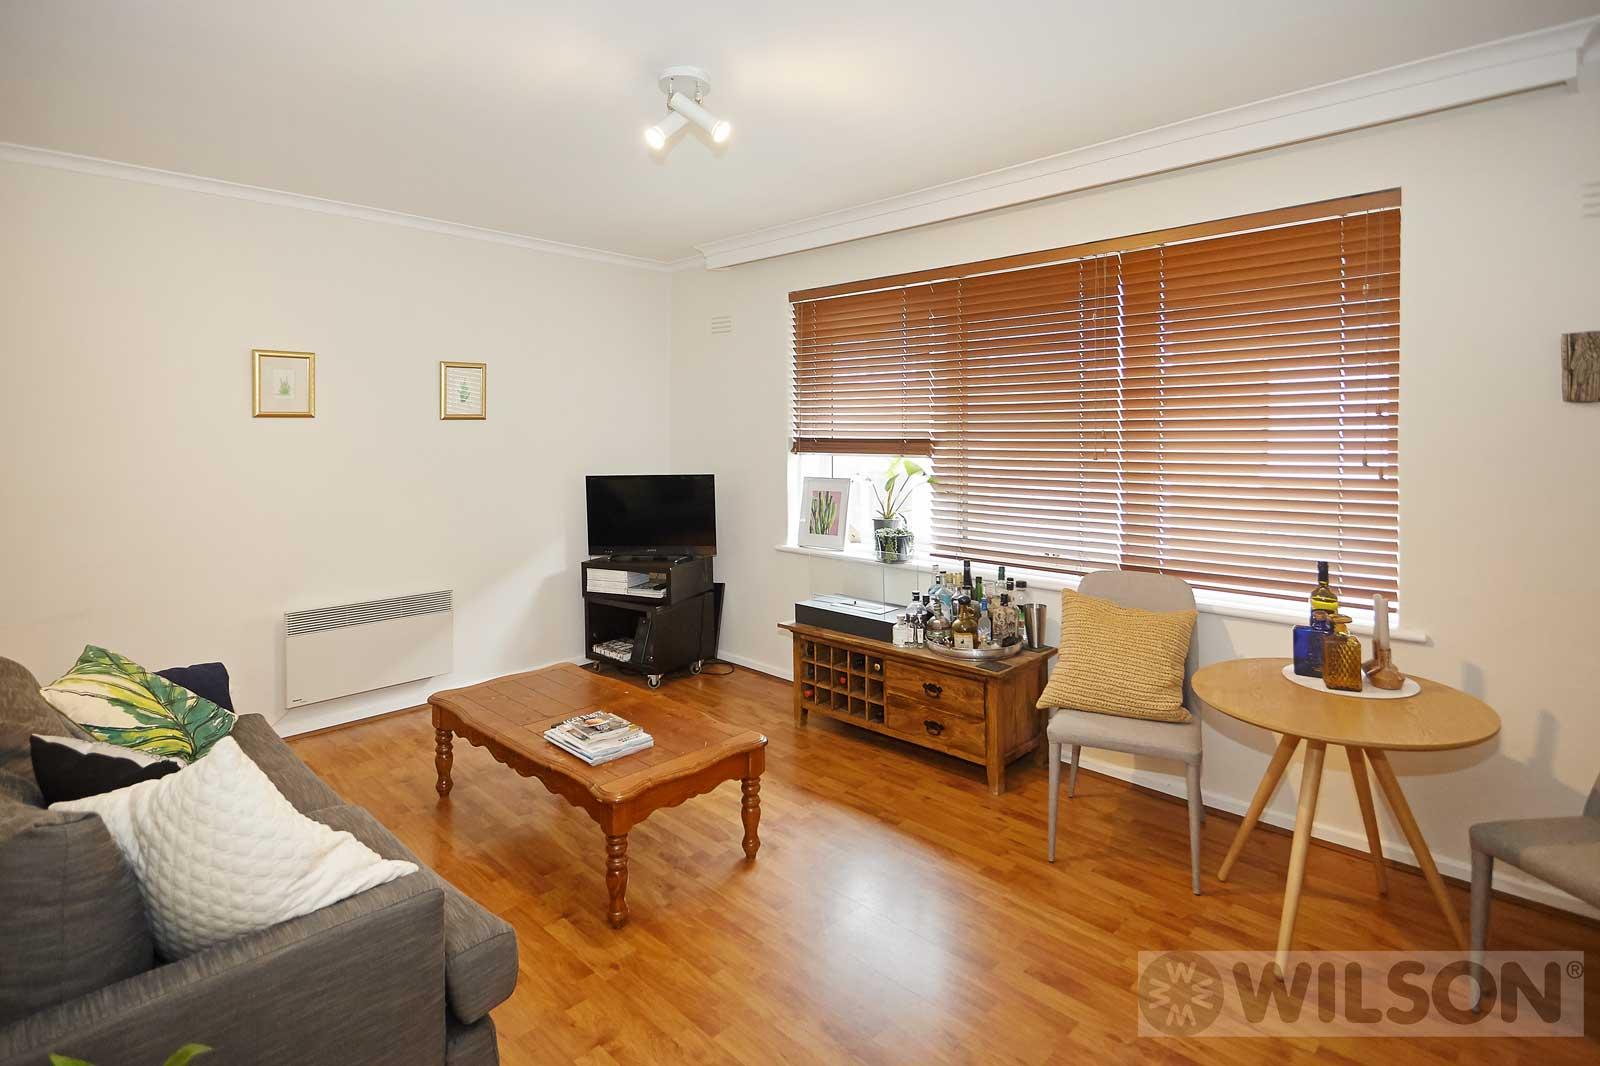 5/132 Alexandra Street, St Kilda East VIC 3183 - Apartment For Sale - 2013838408